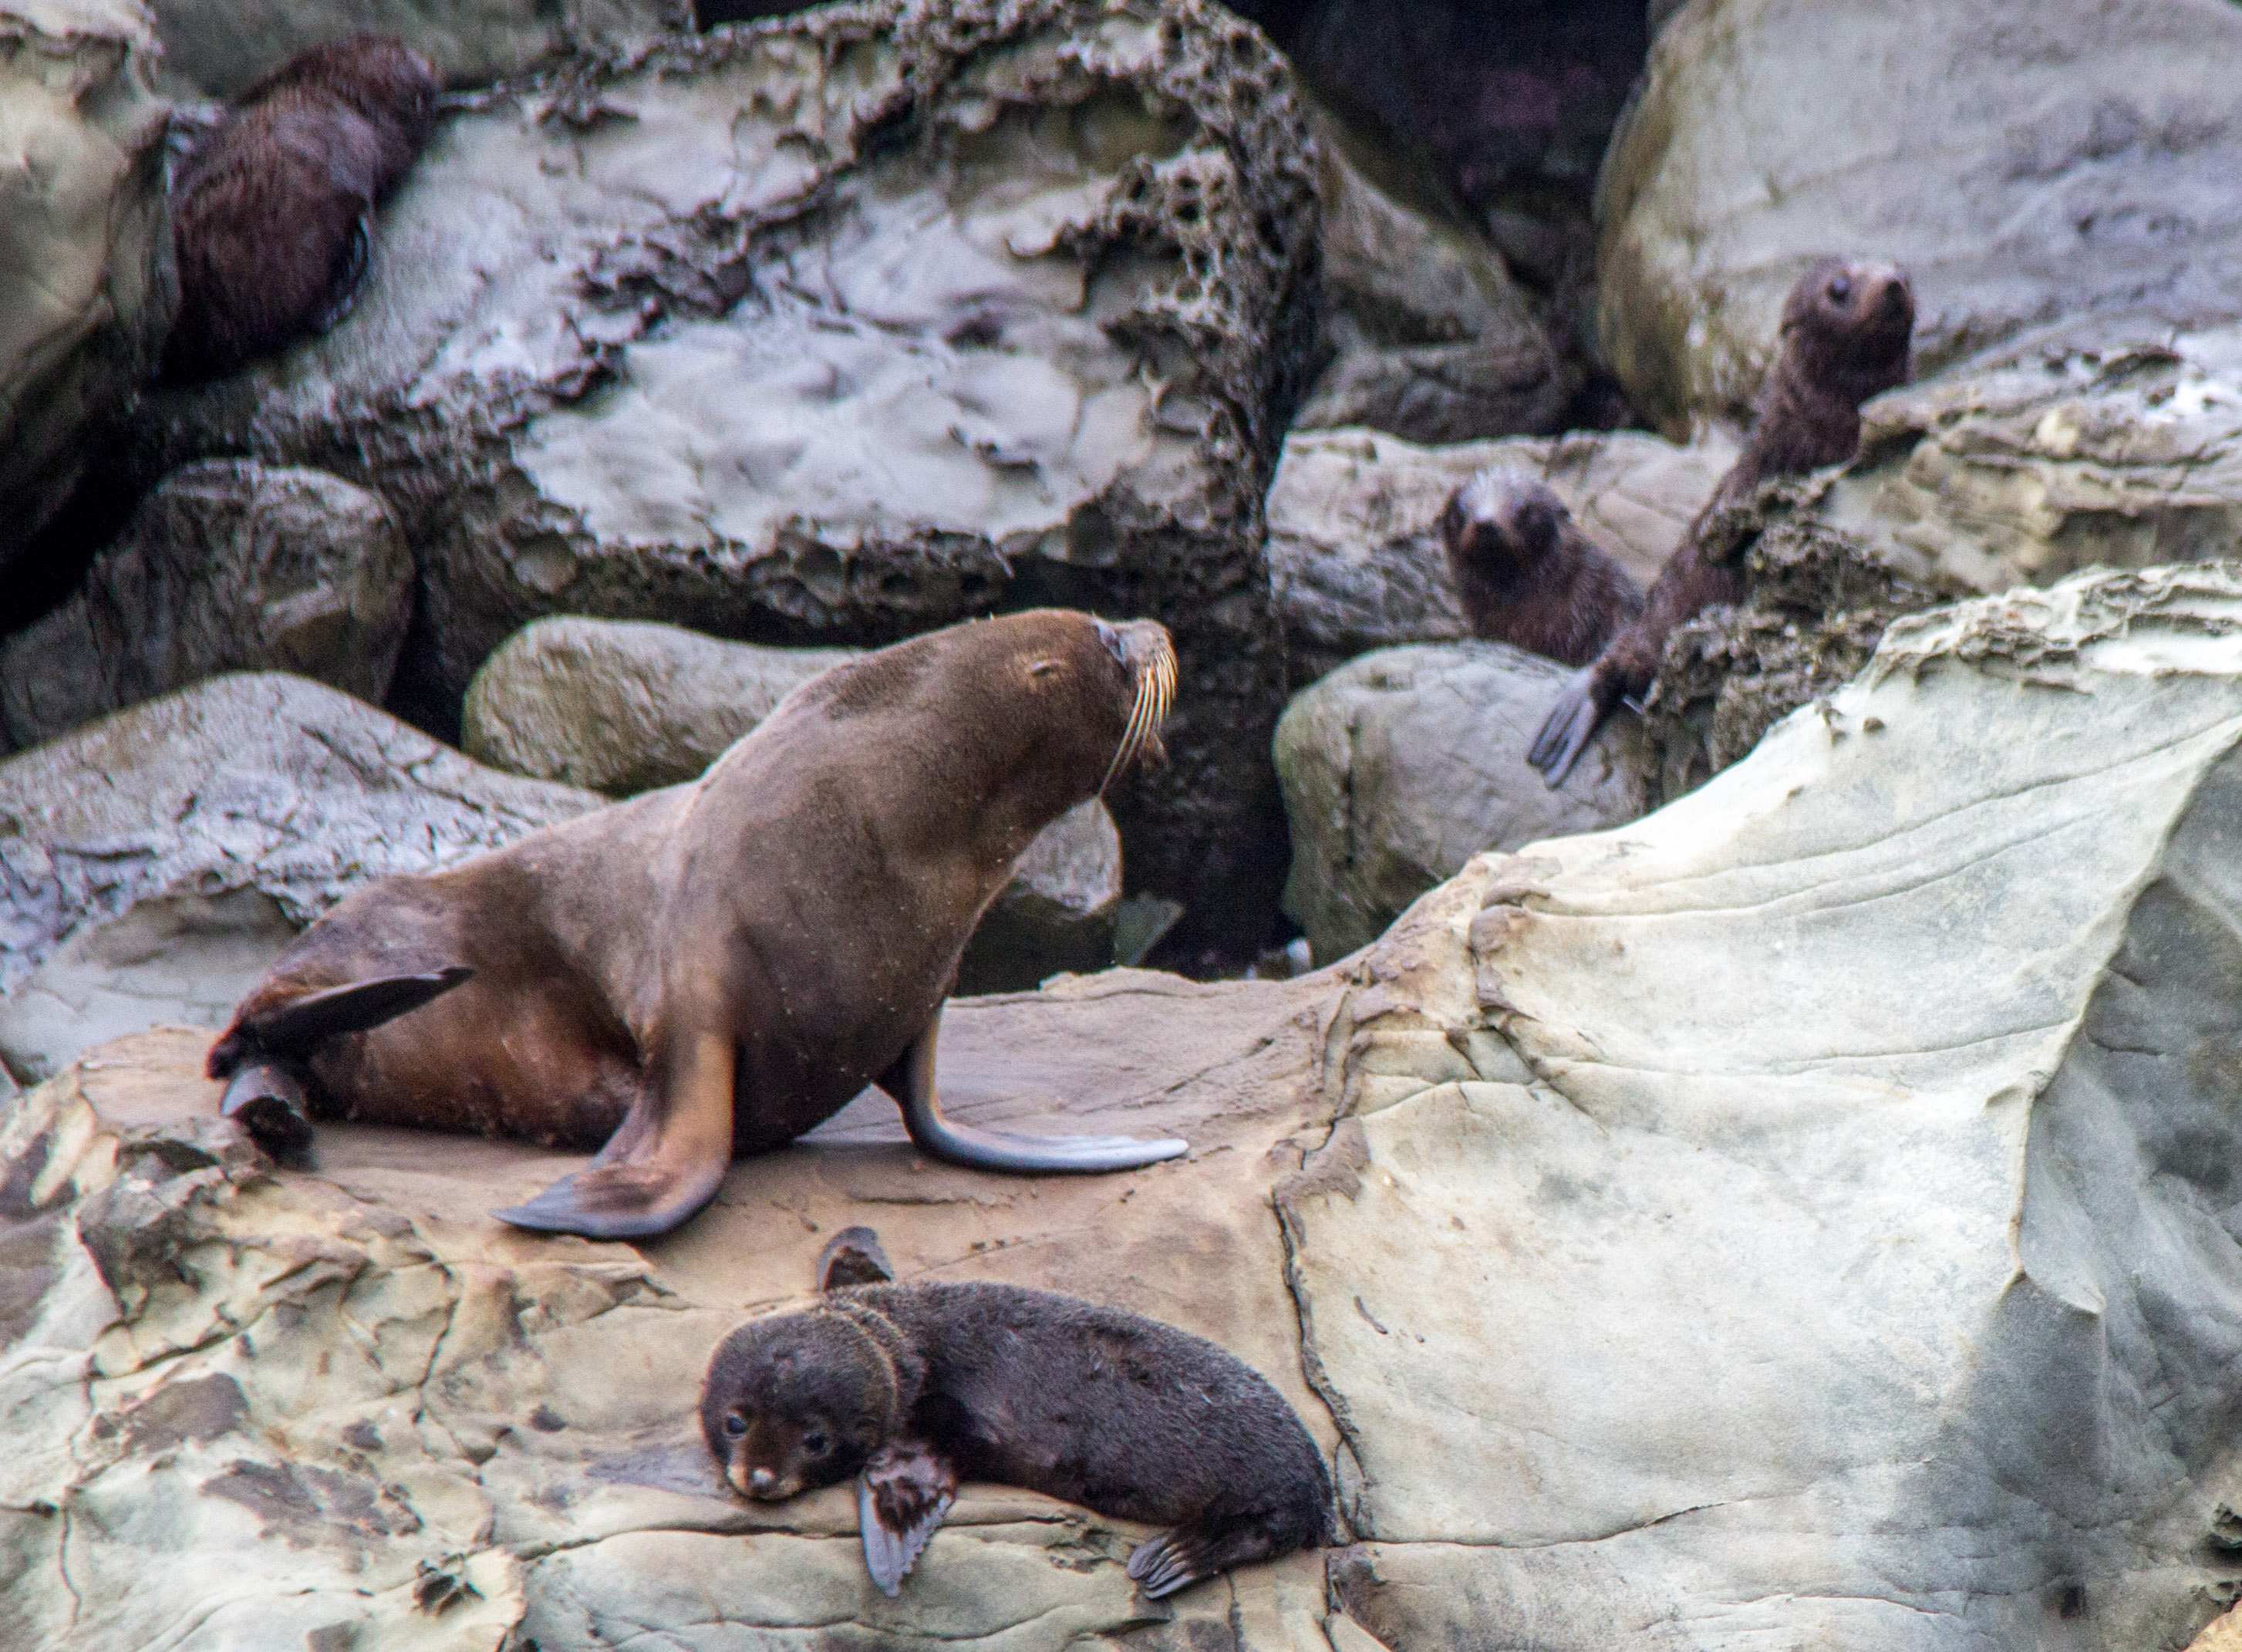 Seal pups misbehaving